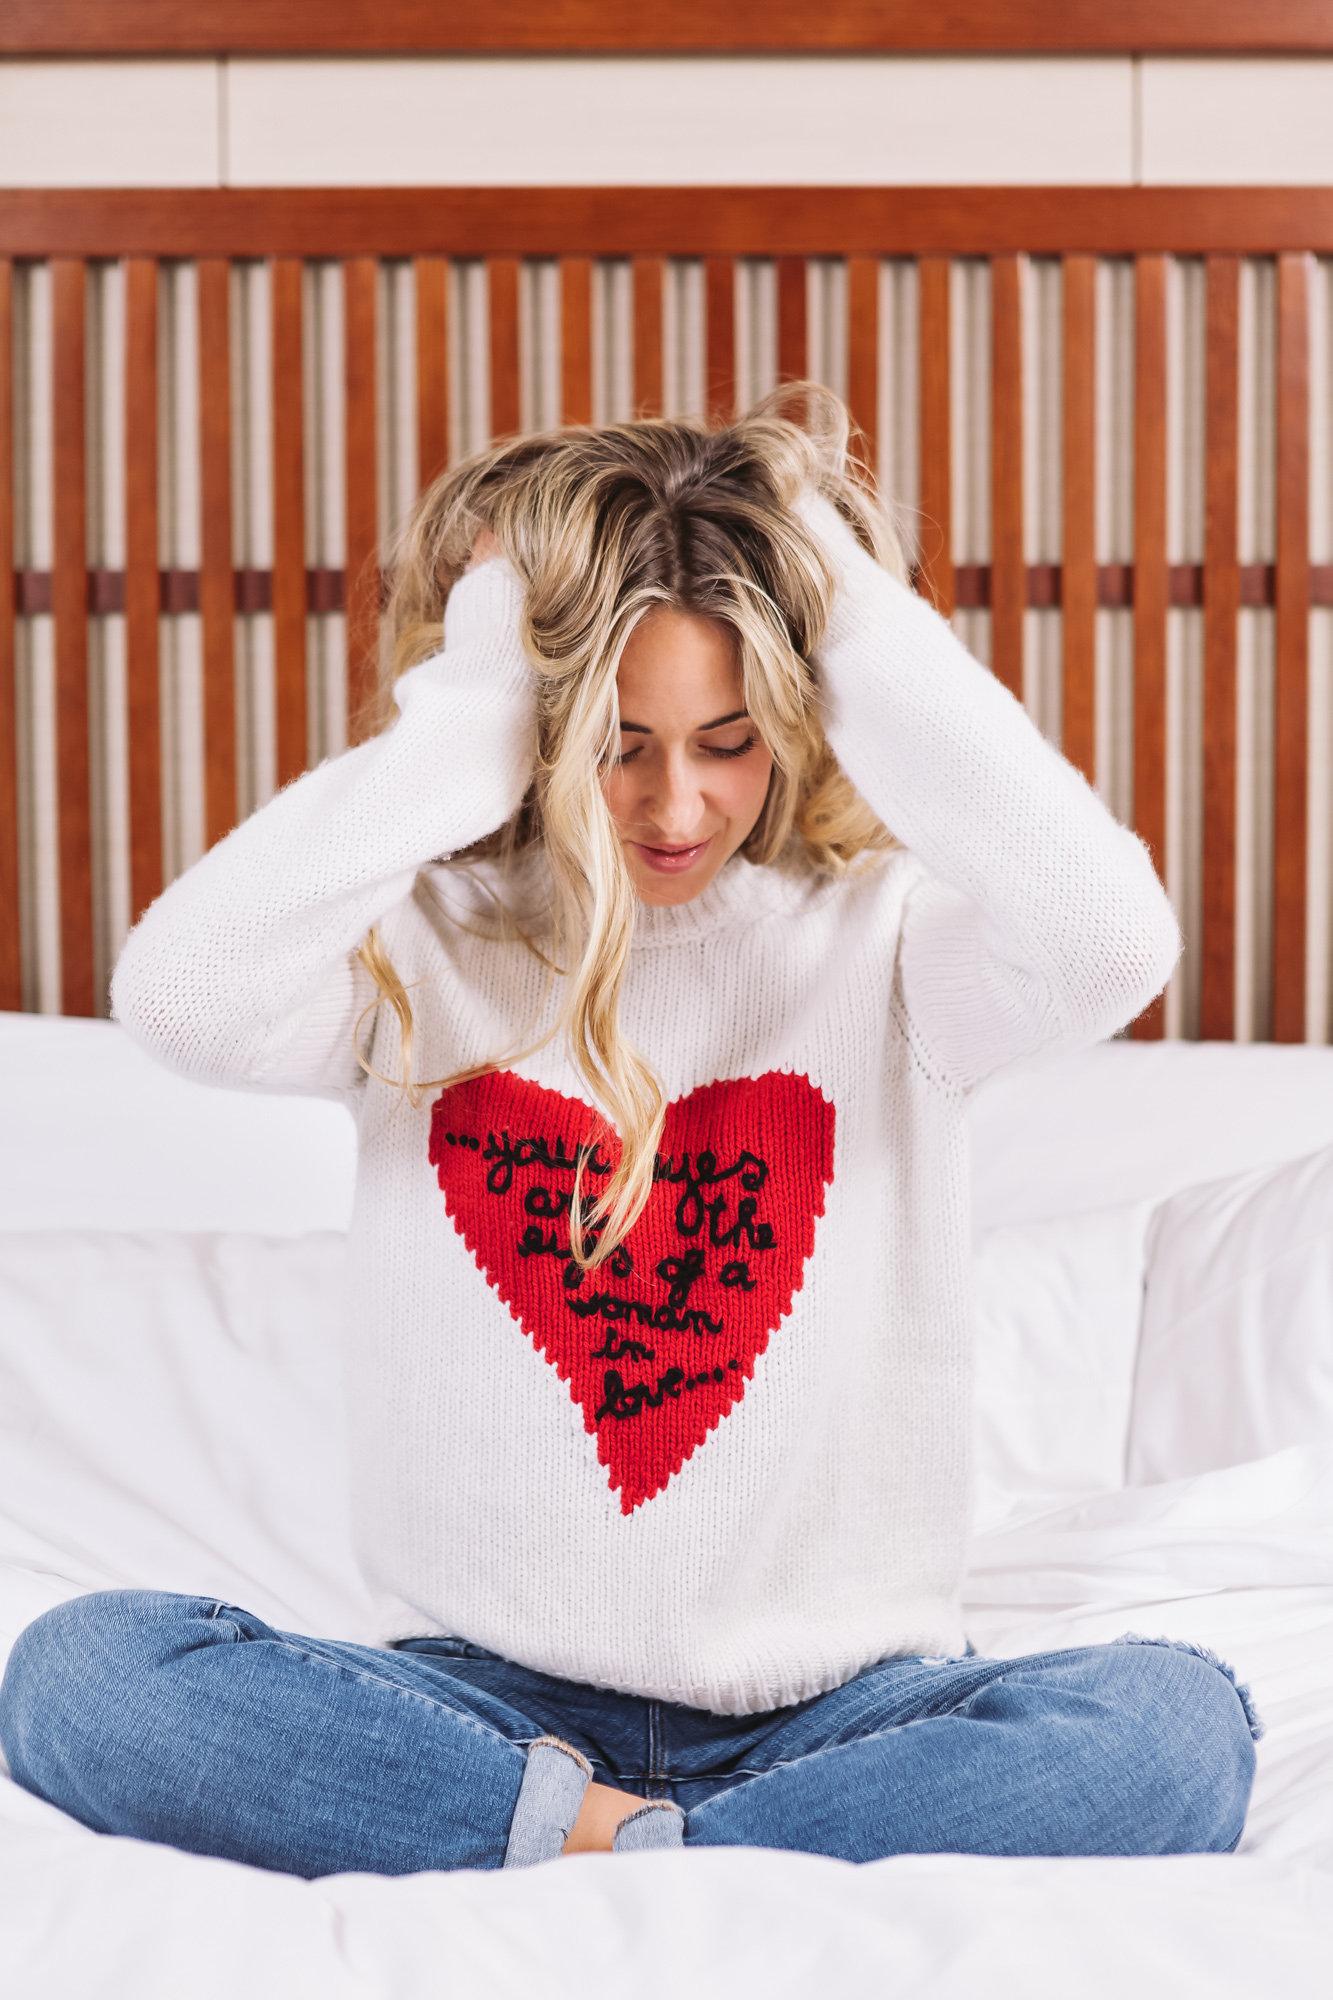 Tiffany & Co  Jewels, Pyjama's, Saint Laurent Dress, See by Chloe Dress, Valentino Sweater & Frame Denim all via  Nordstrom Vancouver  Photography:  Allison Kuhl  Location:  Shangri-La Vancouver